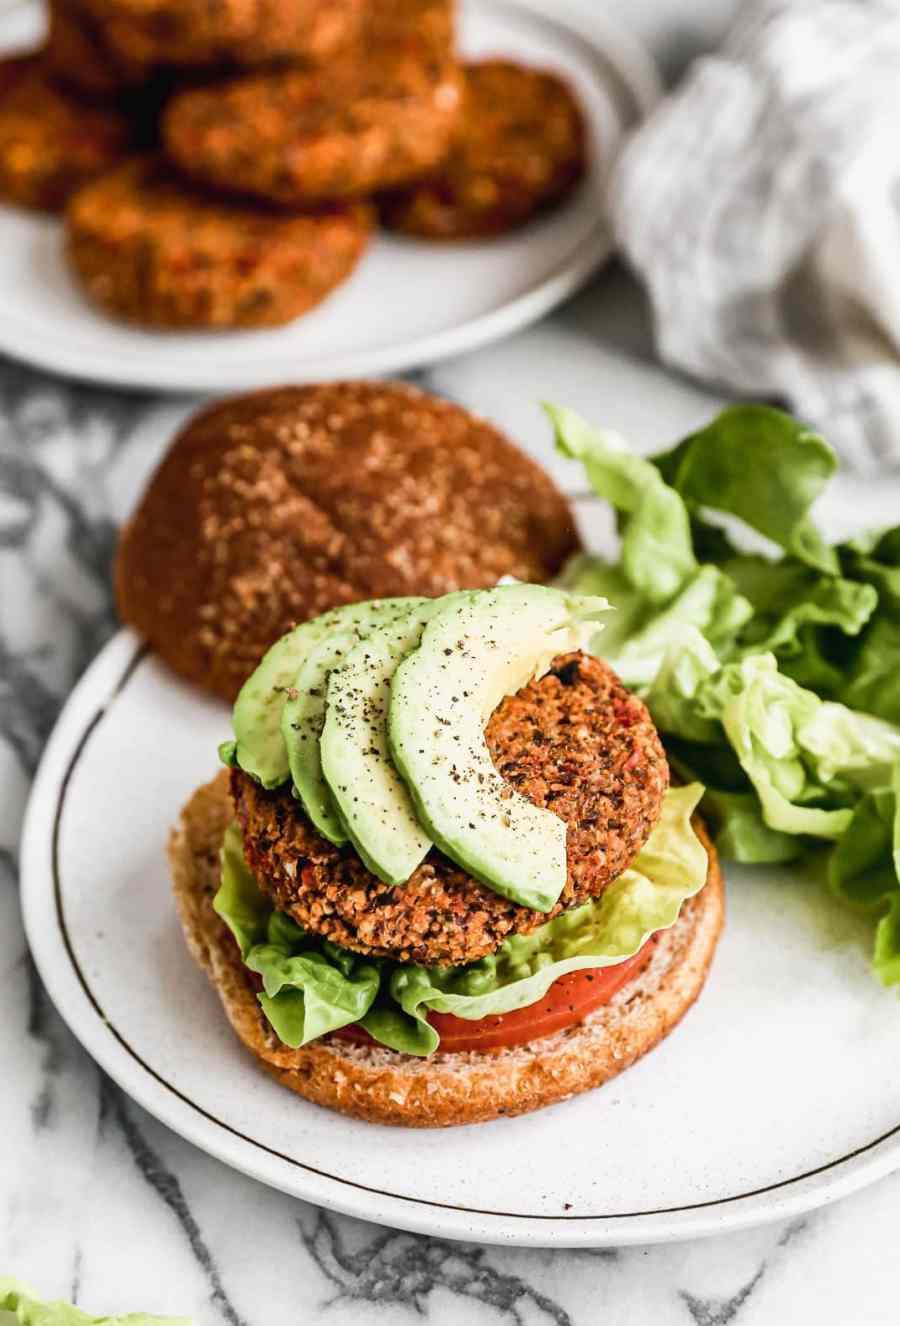 Two vegan burger patties on buns